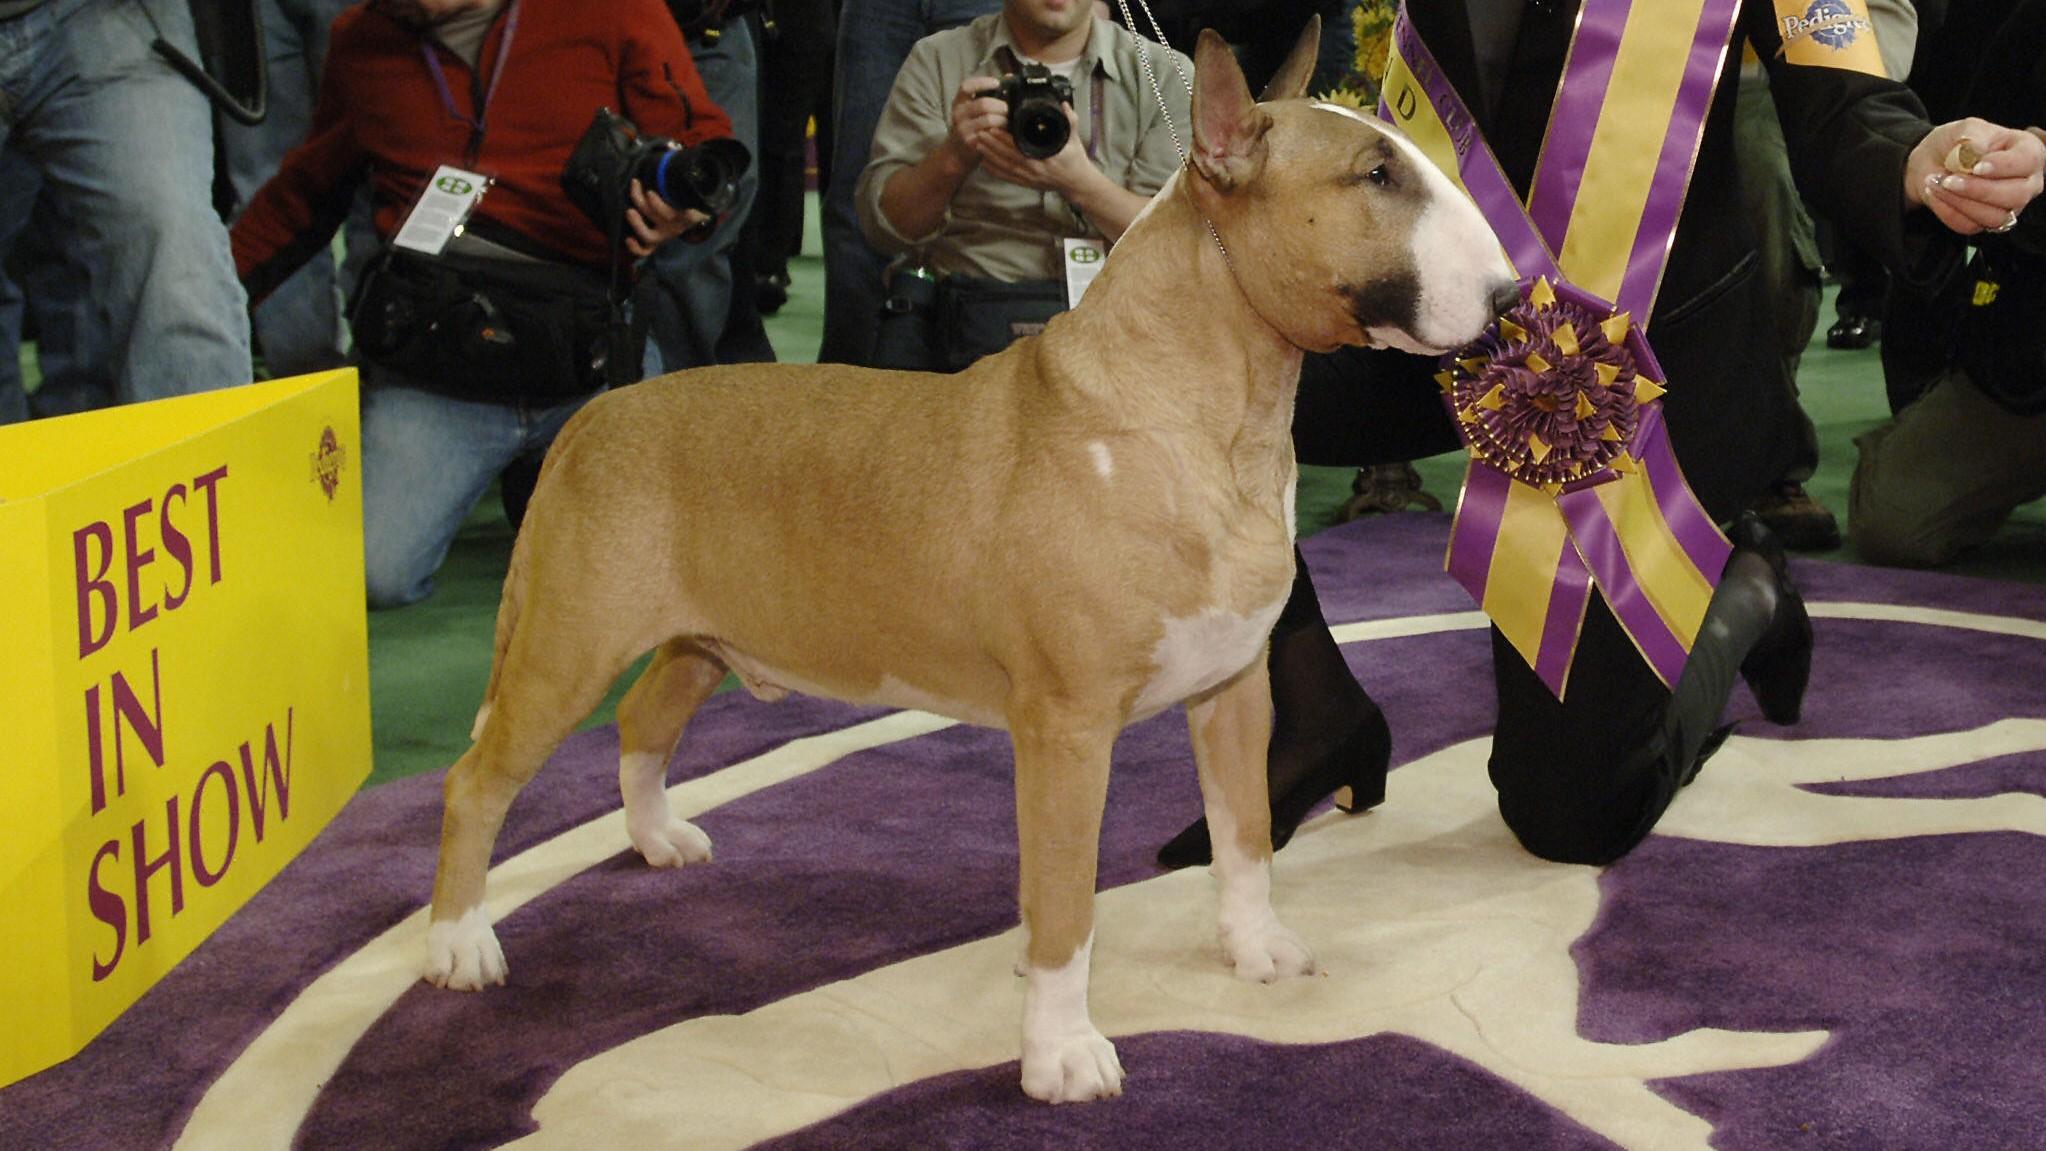 Westminster-Dog-Show-060821-GETTY-FTR